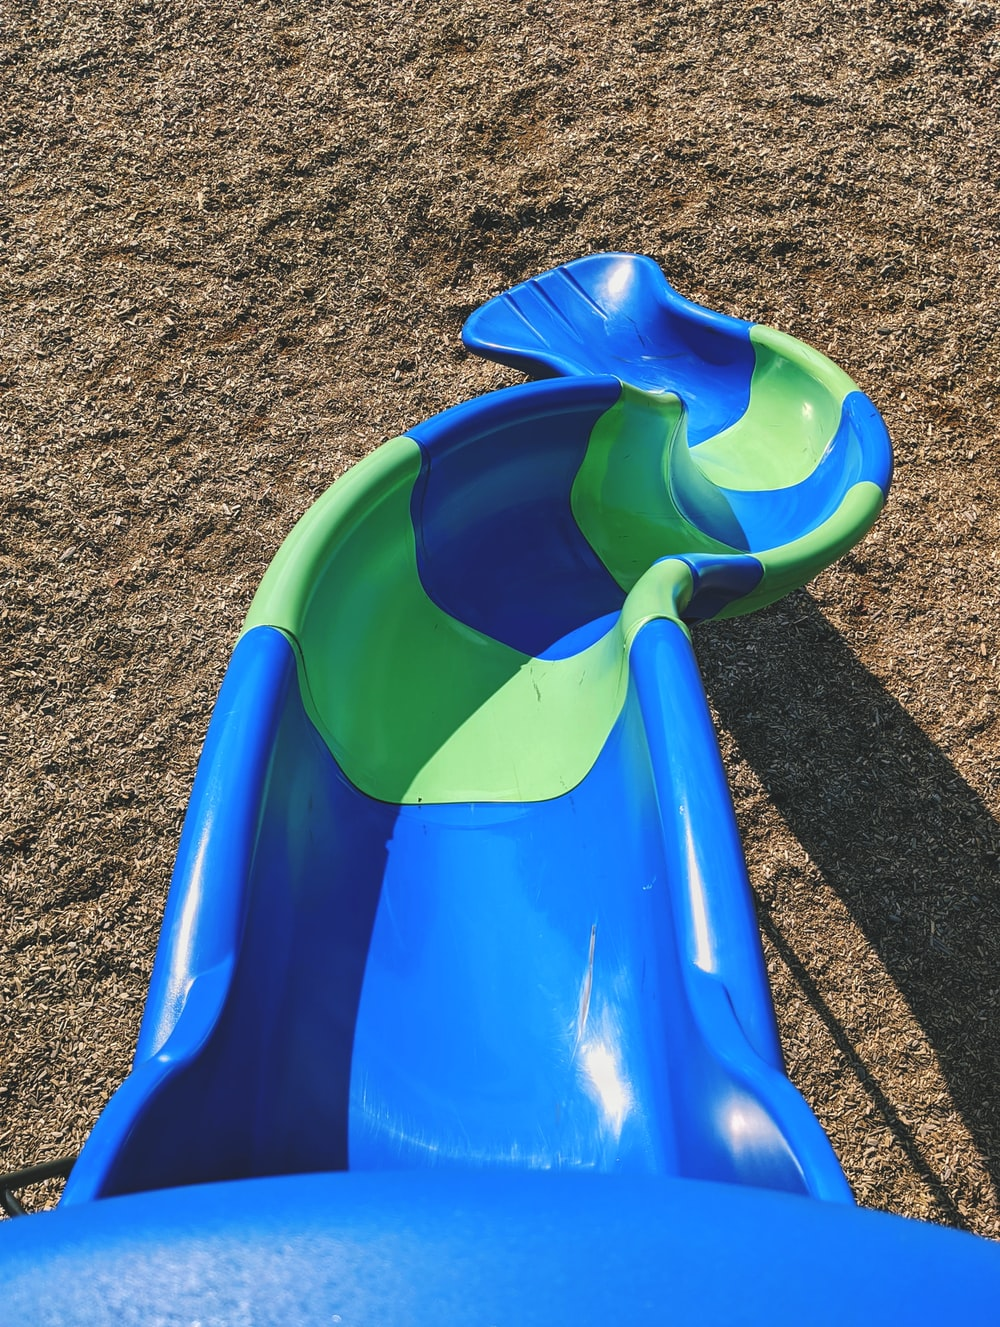 blue plastic slide on brown sand